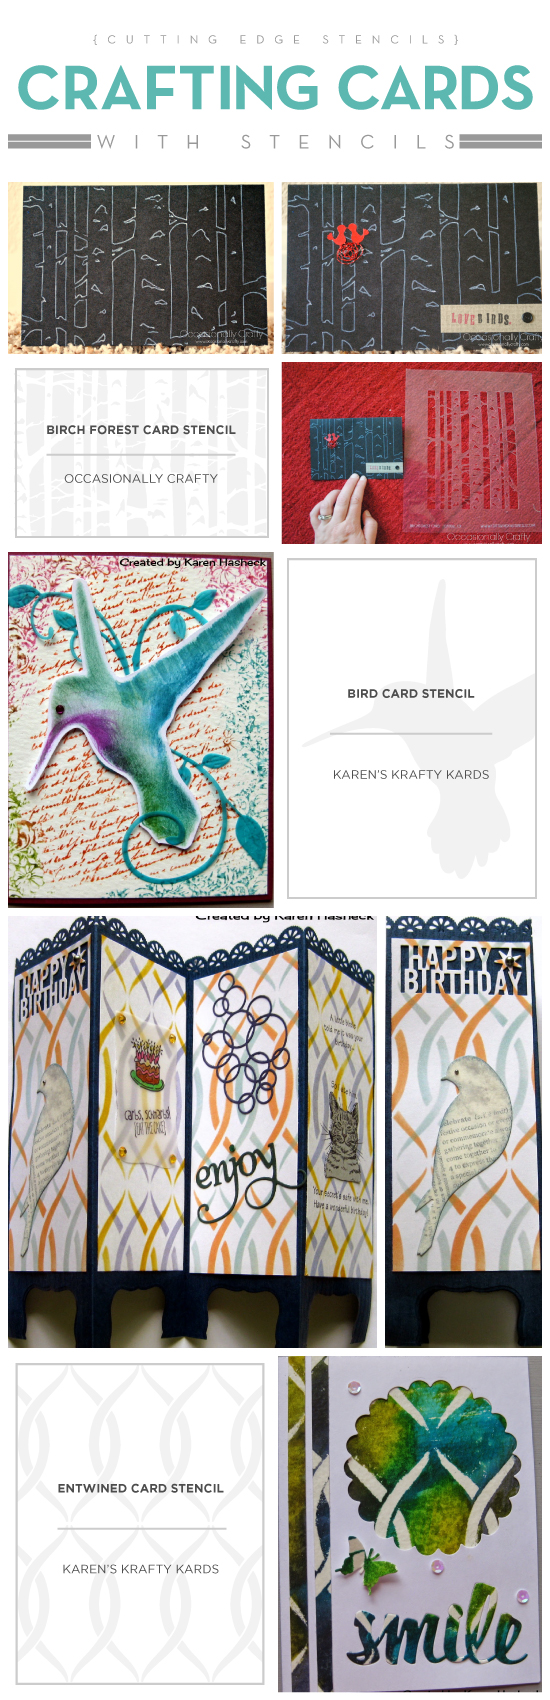 Cutting Edge Stencils shares stenciled card ideas using card stencil templates. http://www.cuttingedgestencils.com/stencil-templates-card-stencils-scrapbooking.html